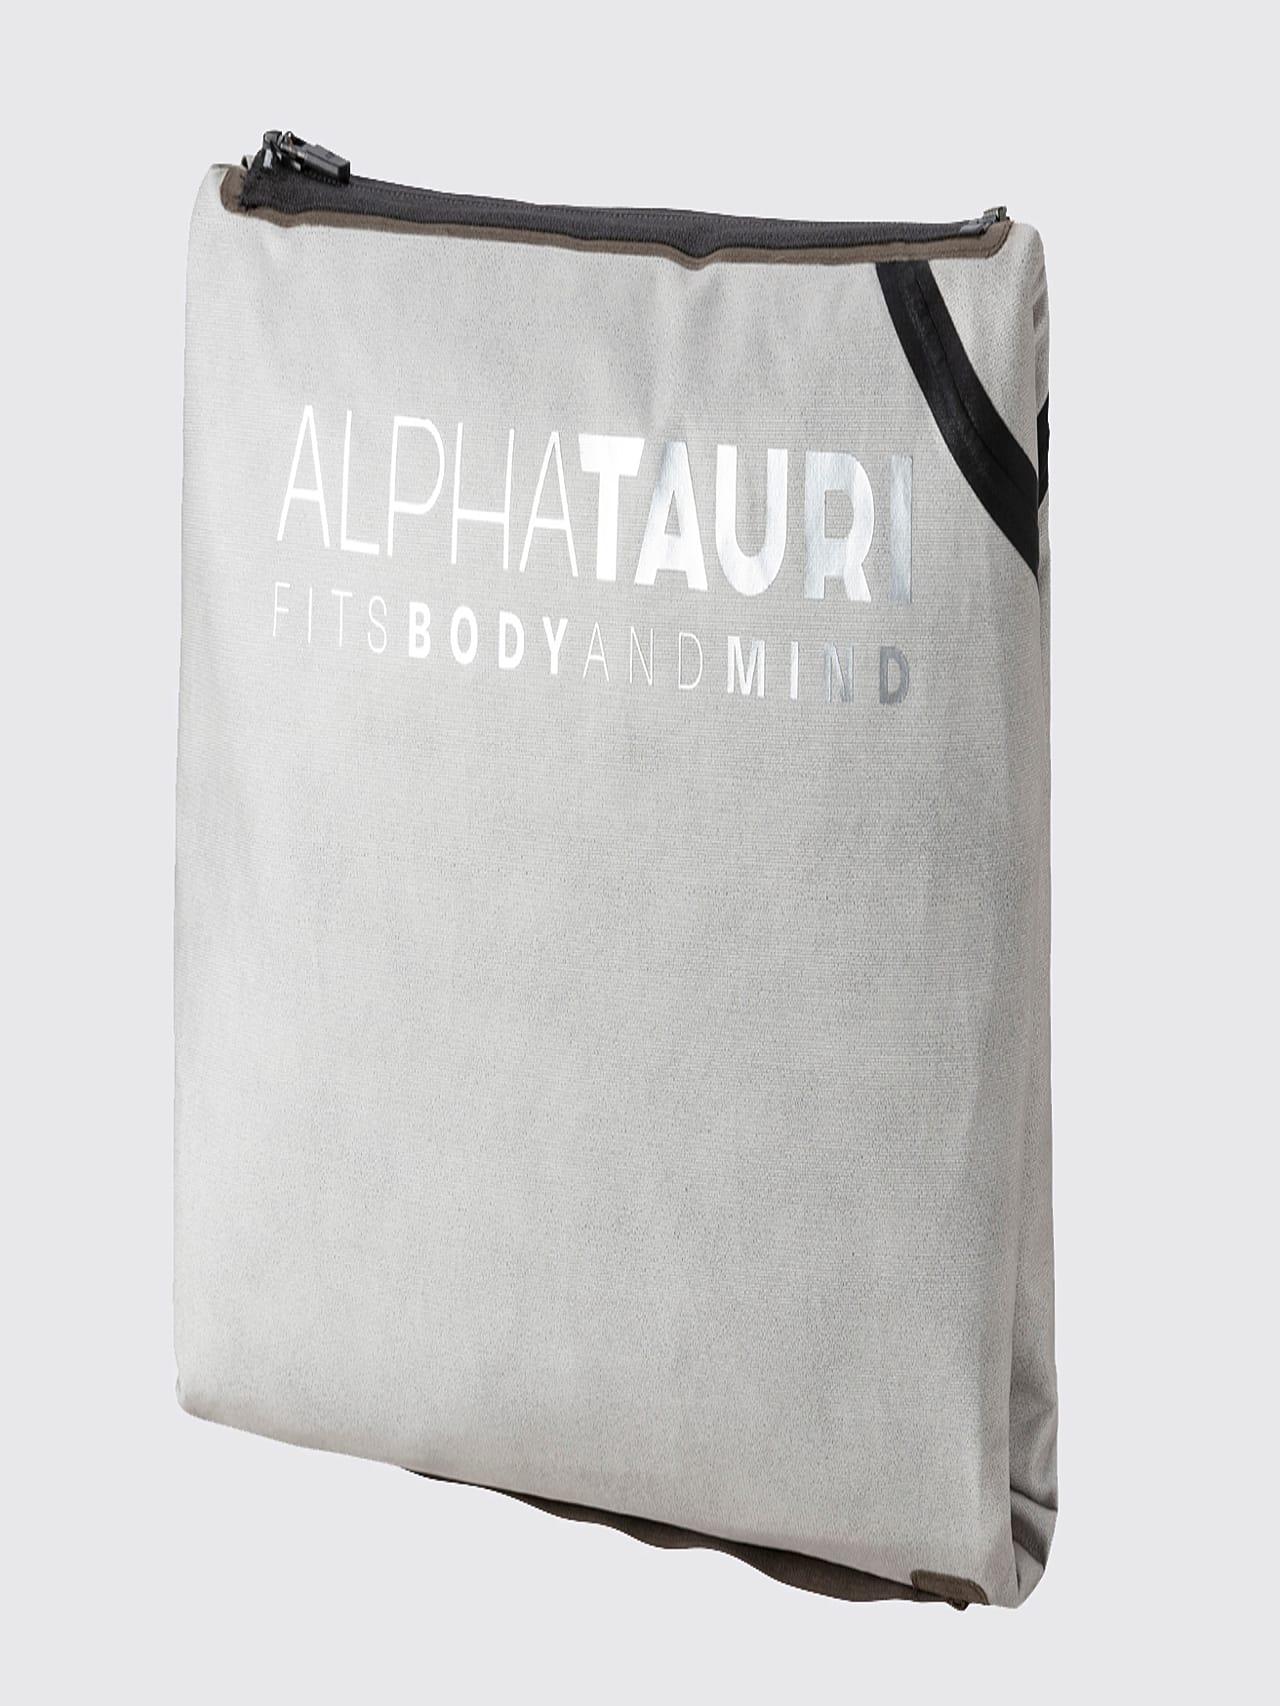 OKOVO V3.Y5.01 Packable Waterproof Jacket olive scene7.view.9.name Alpha Tauri